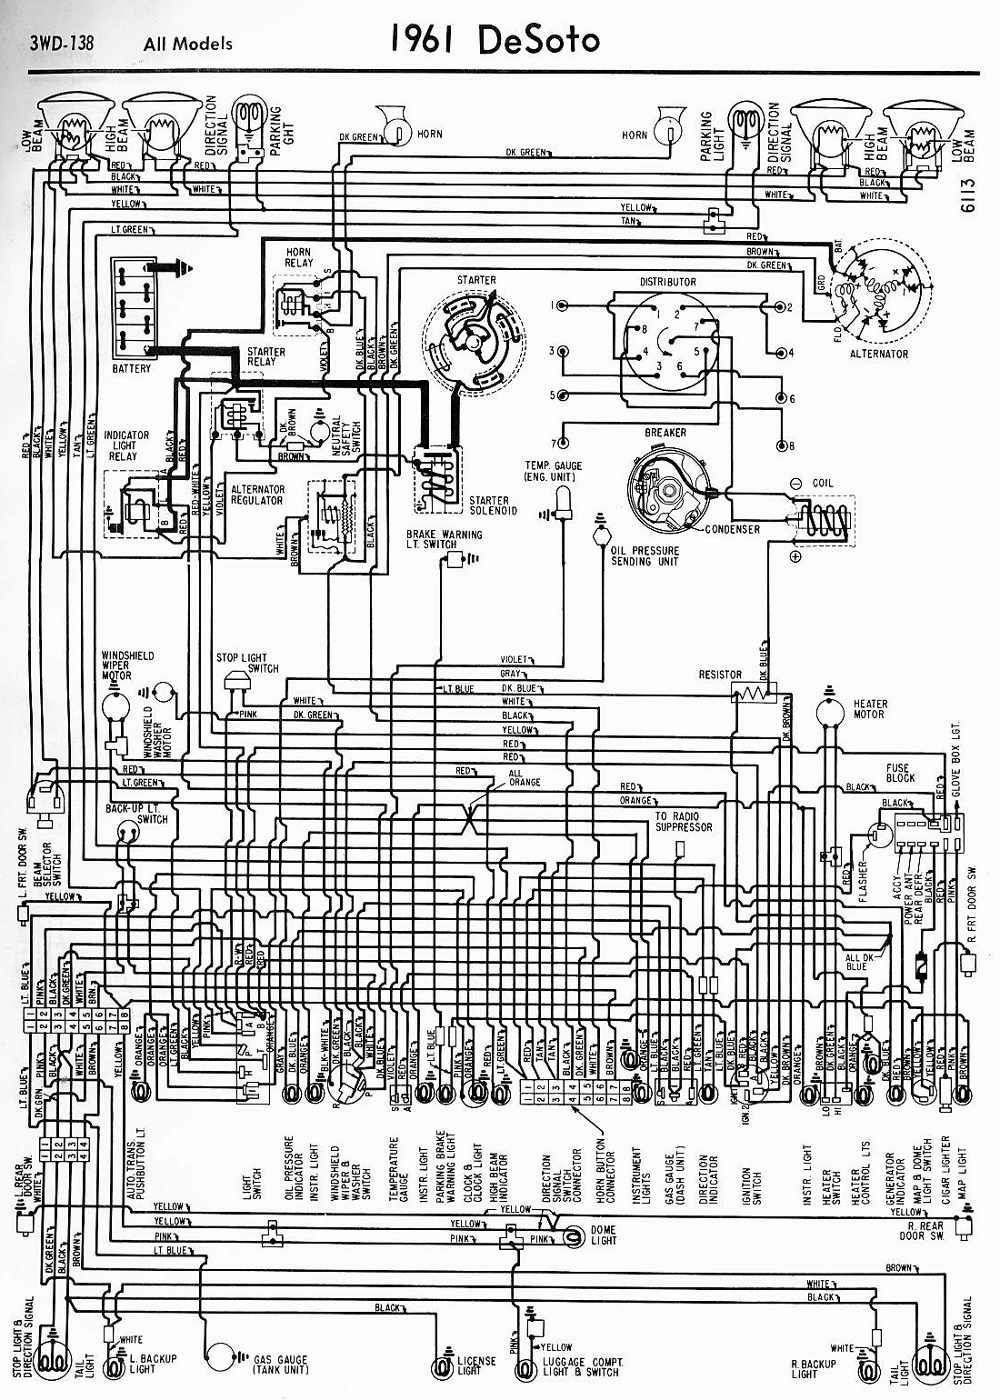 1959 Thunderbird Wiring Diagram | Online Wiring Diagram on 1967 firebird ignition diagram, 1967 body diagram, 1969 firebird parts diagram, 2006 dodge charger engine diagram, 1969 dodge vacuum diagram, 1967 vw beetle engine diagram,